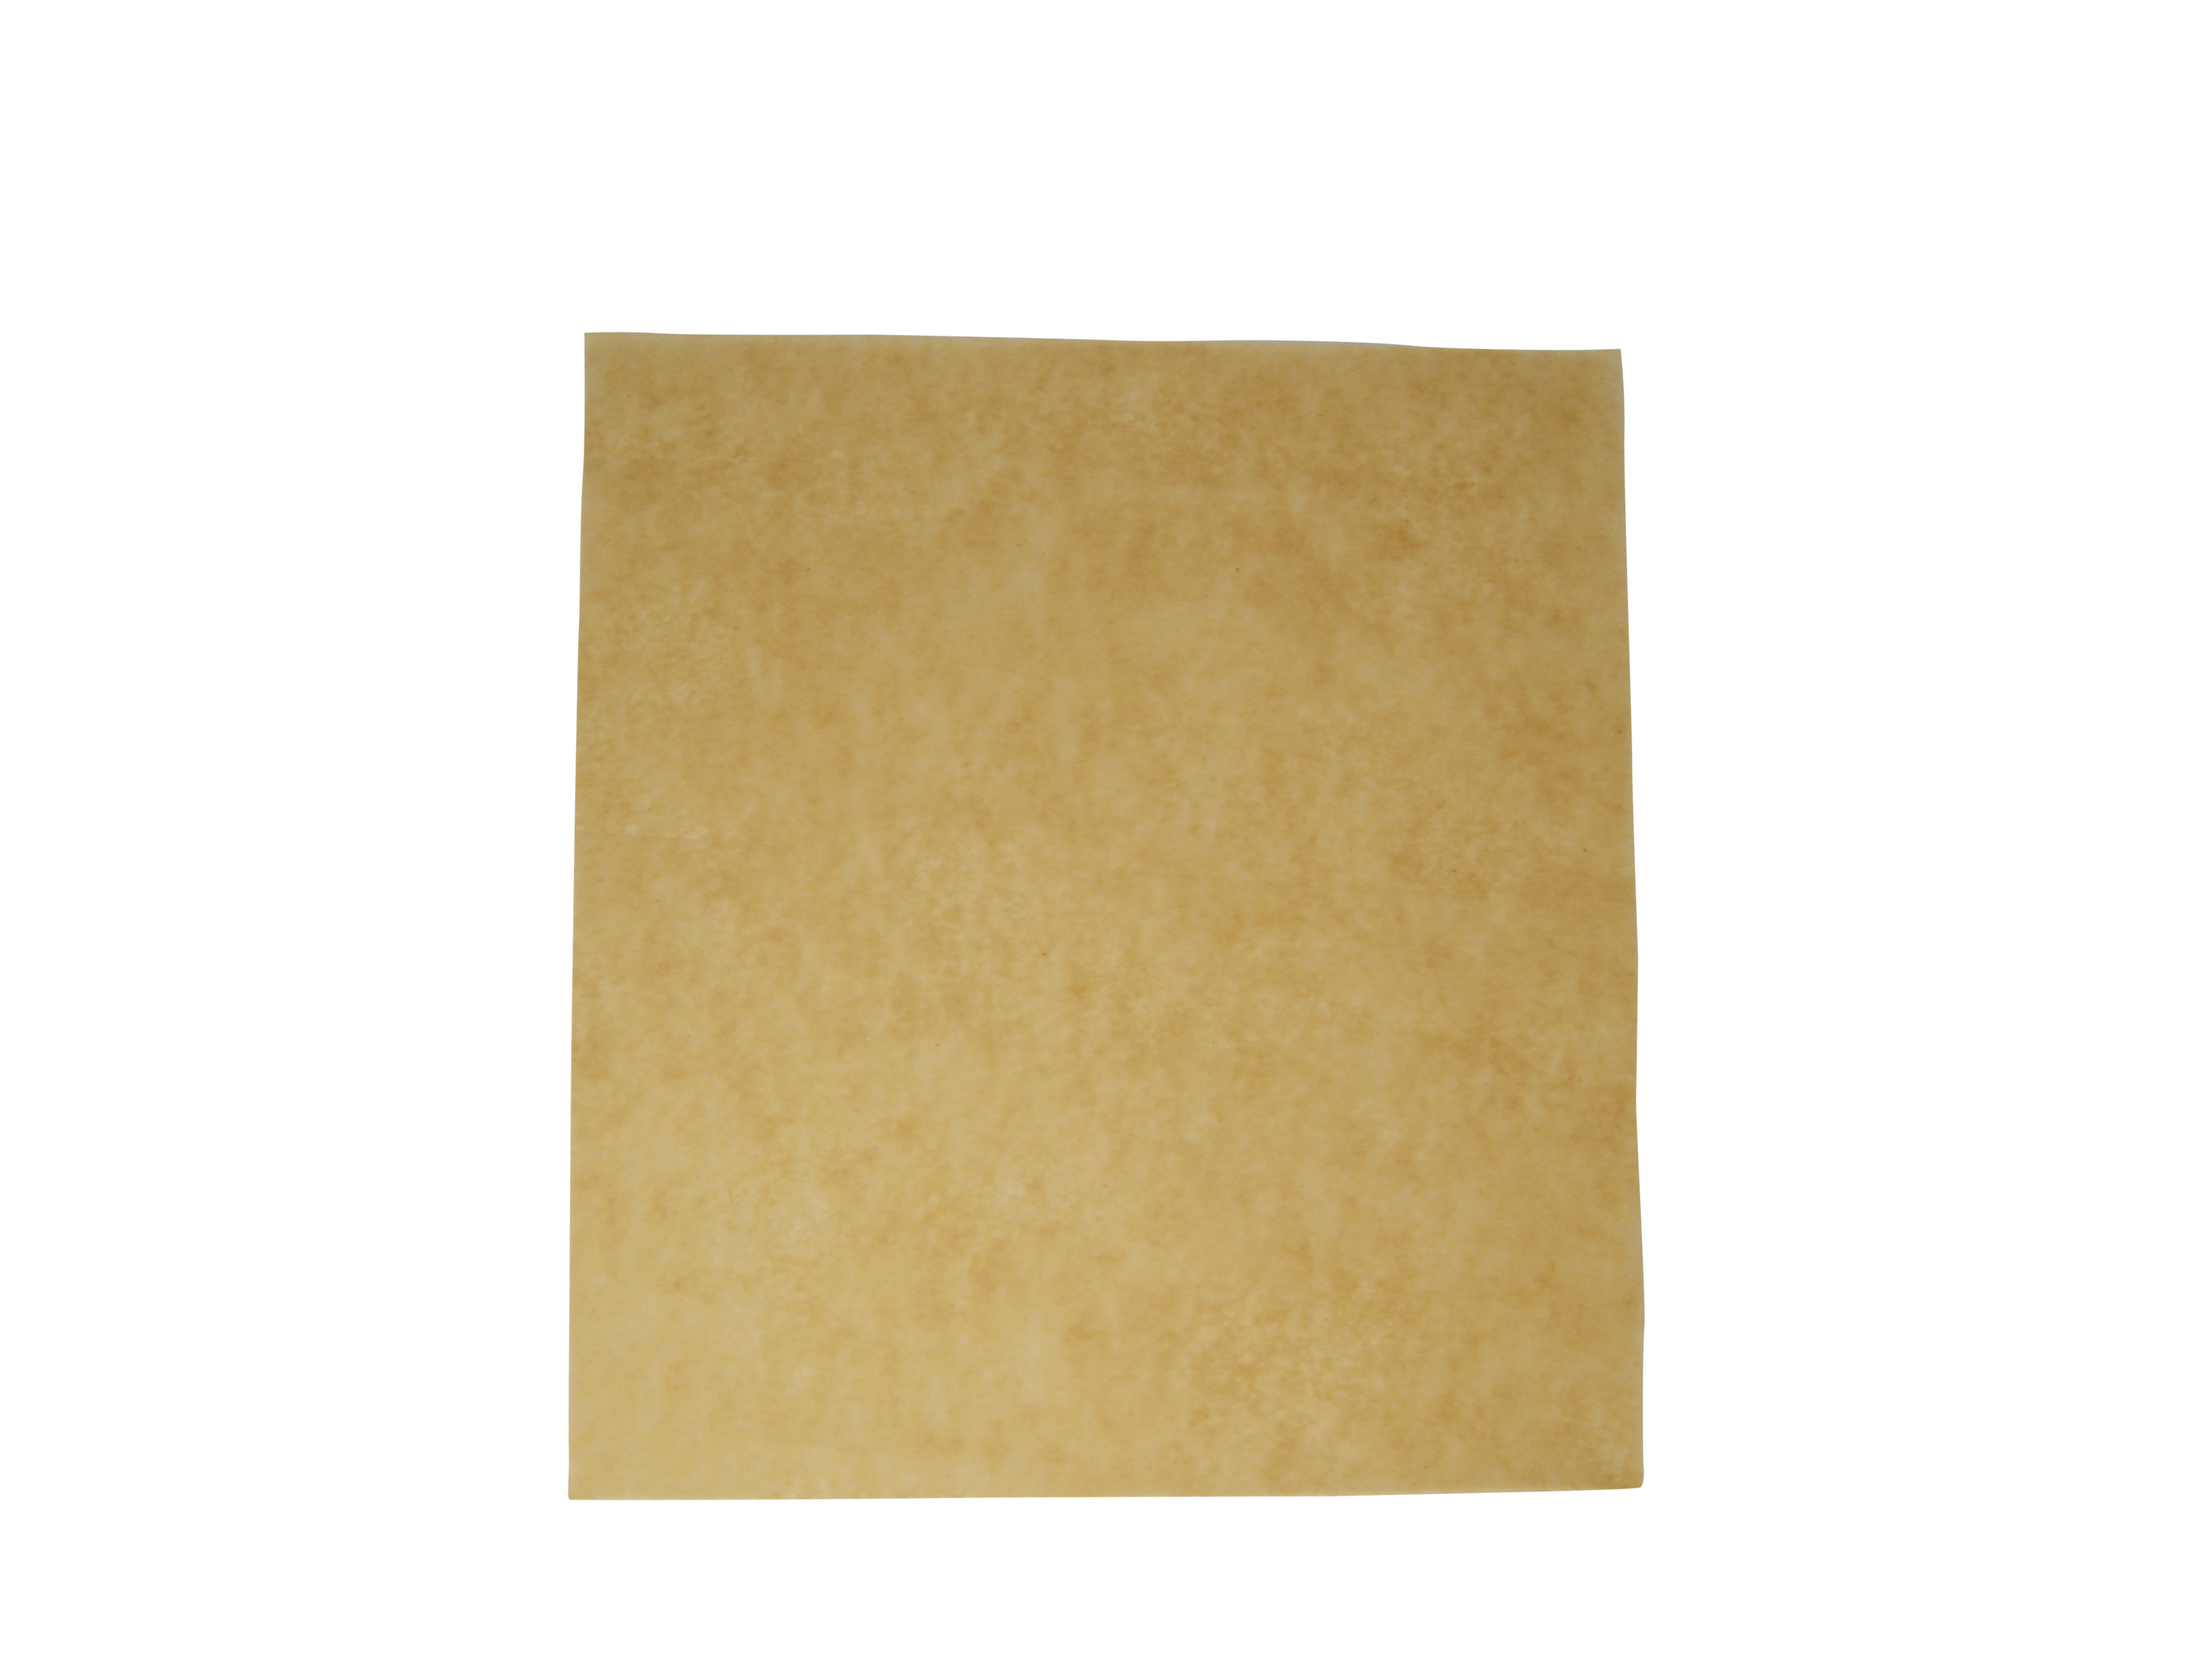 Carta antiunto avana 50gr (500 pezzi)